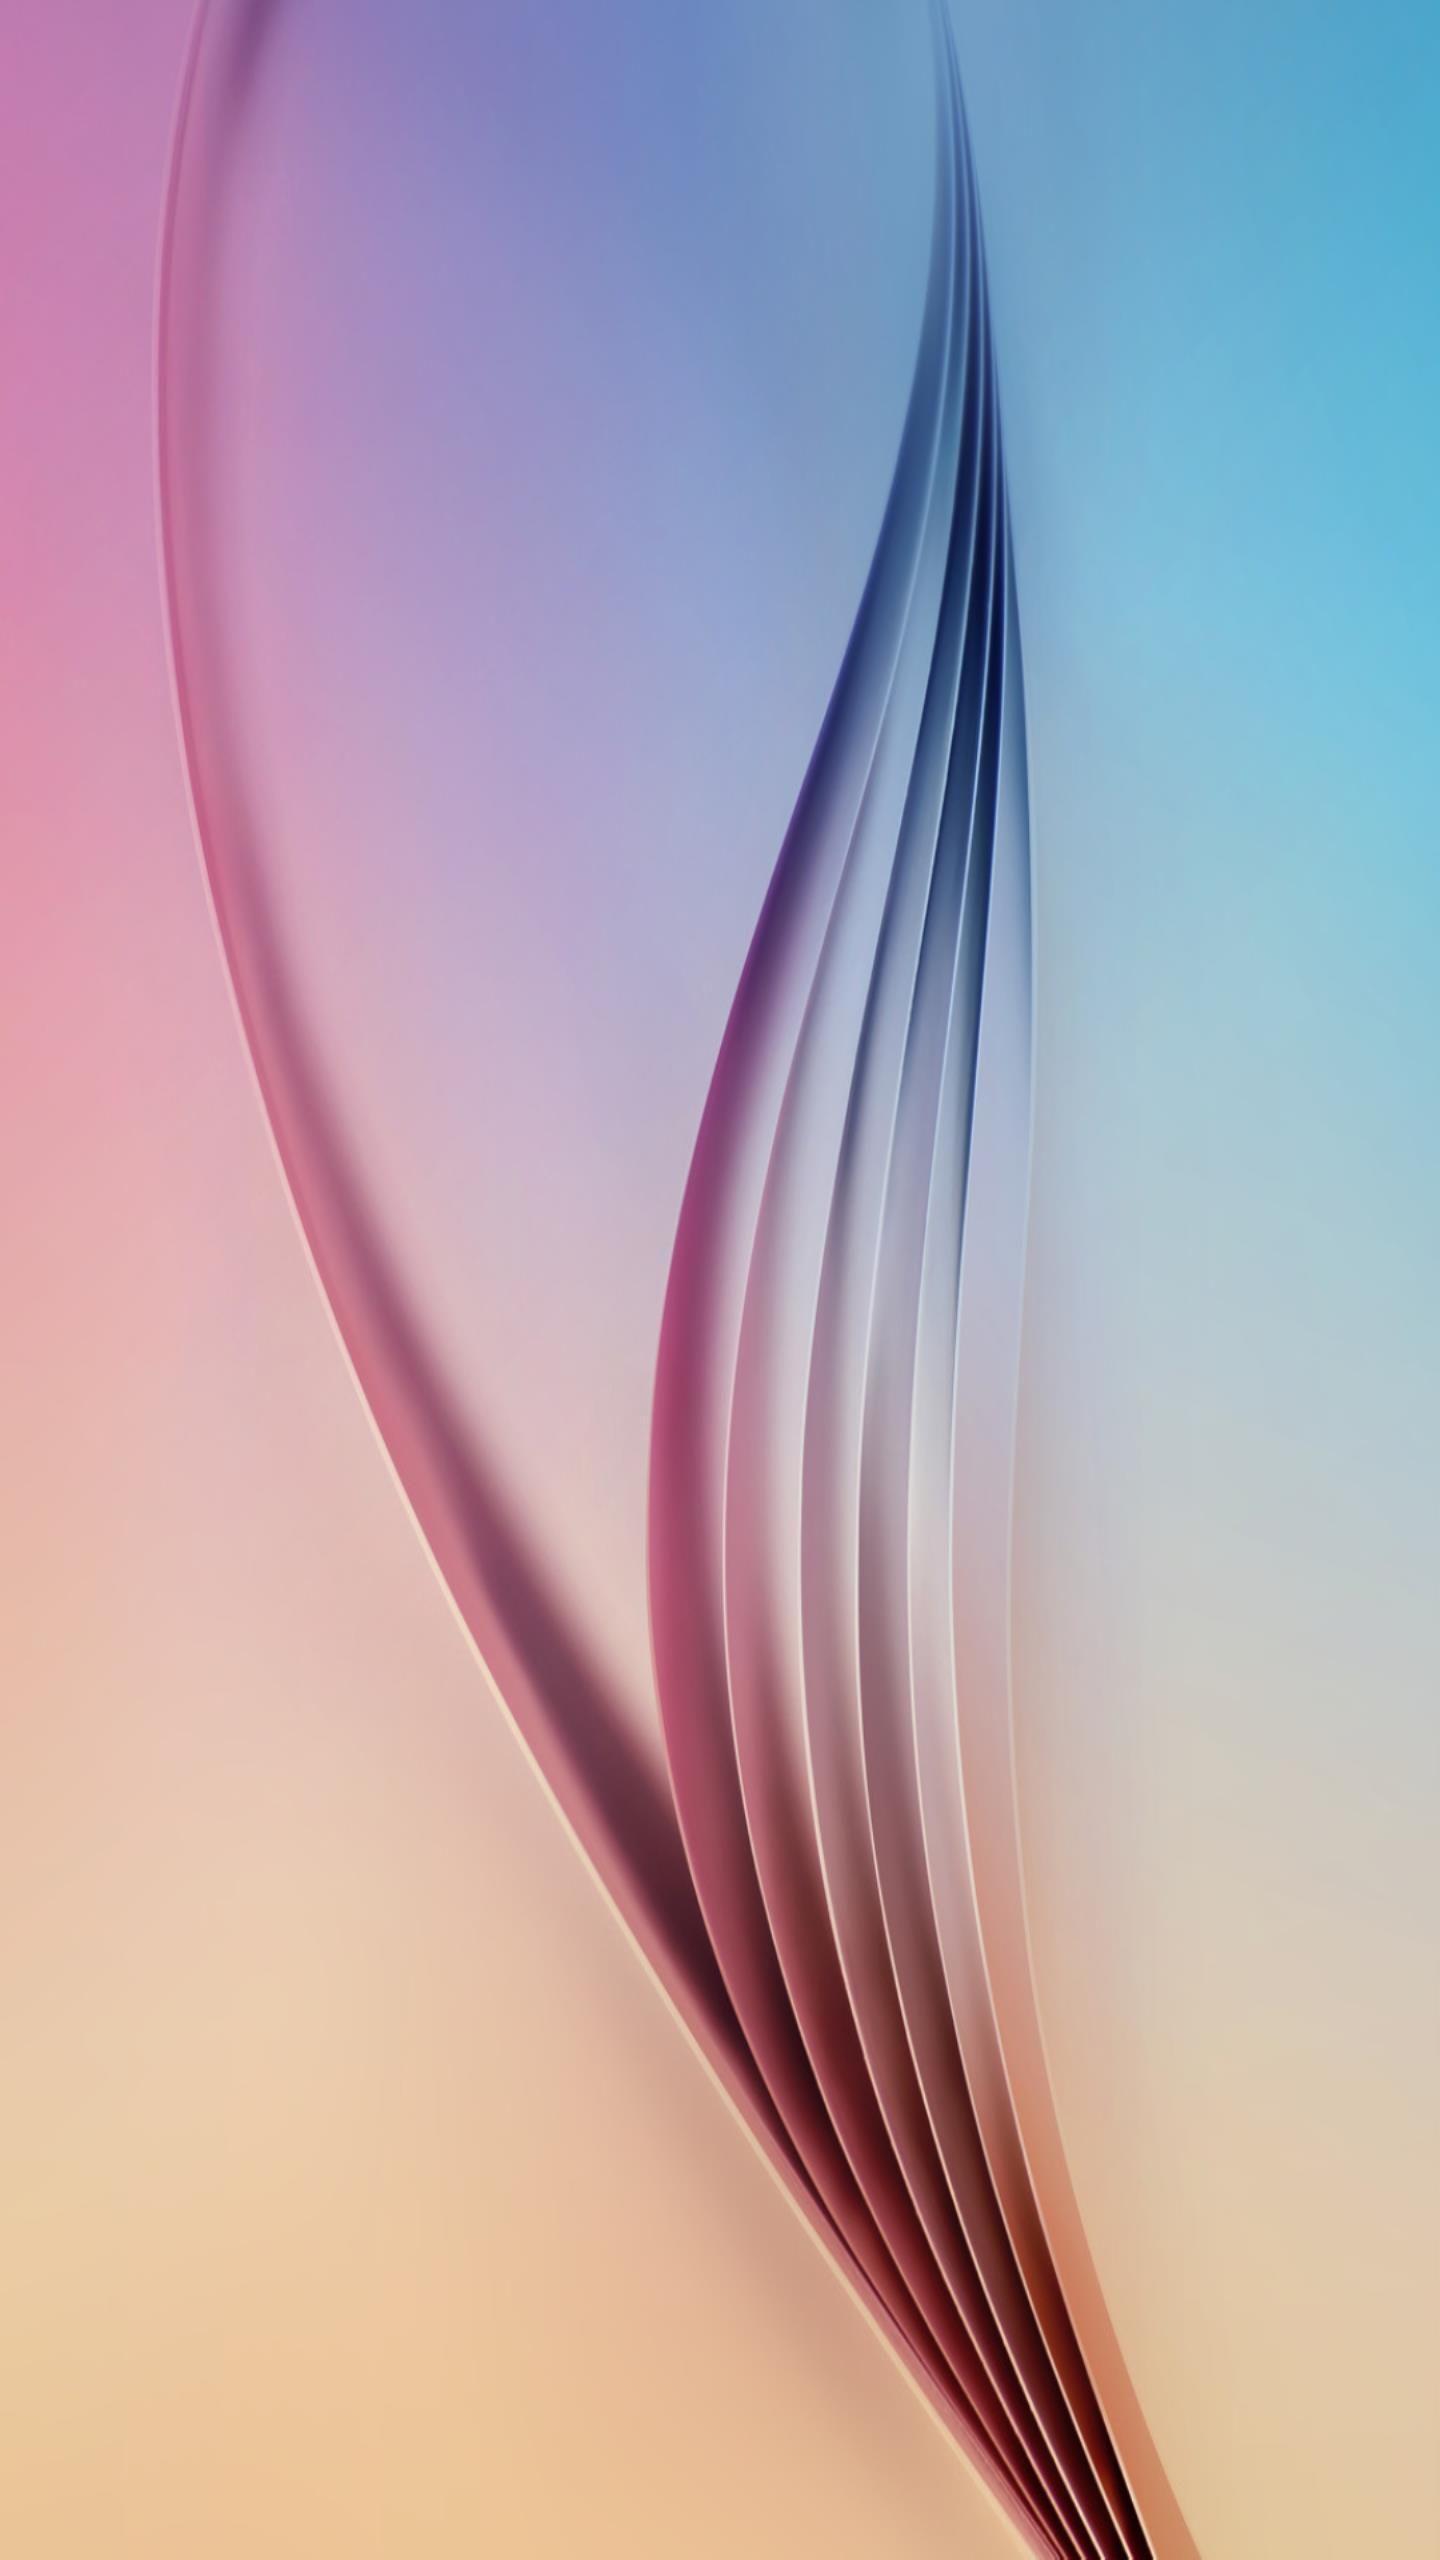 Samsung Galaxy S6 Wallpaper - WallpaperSafari